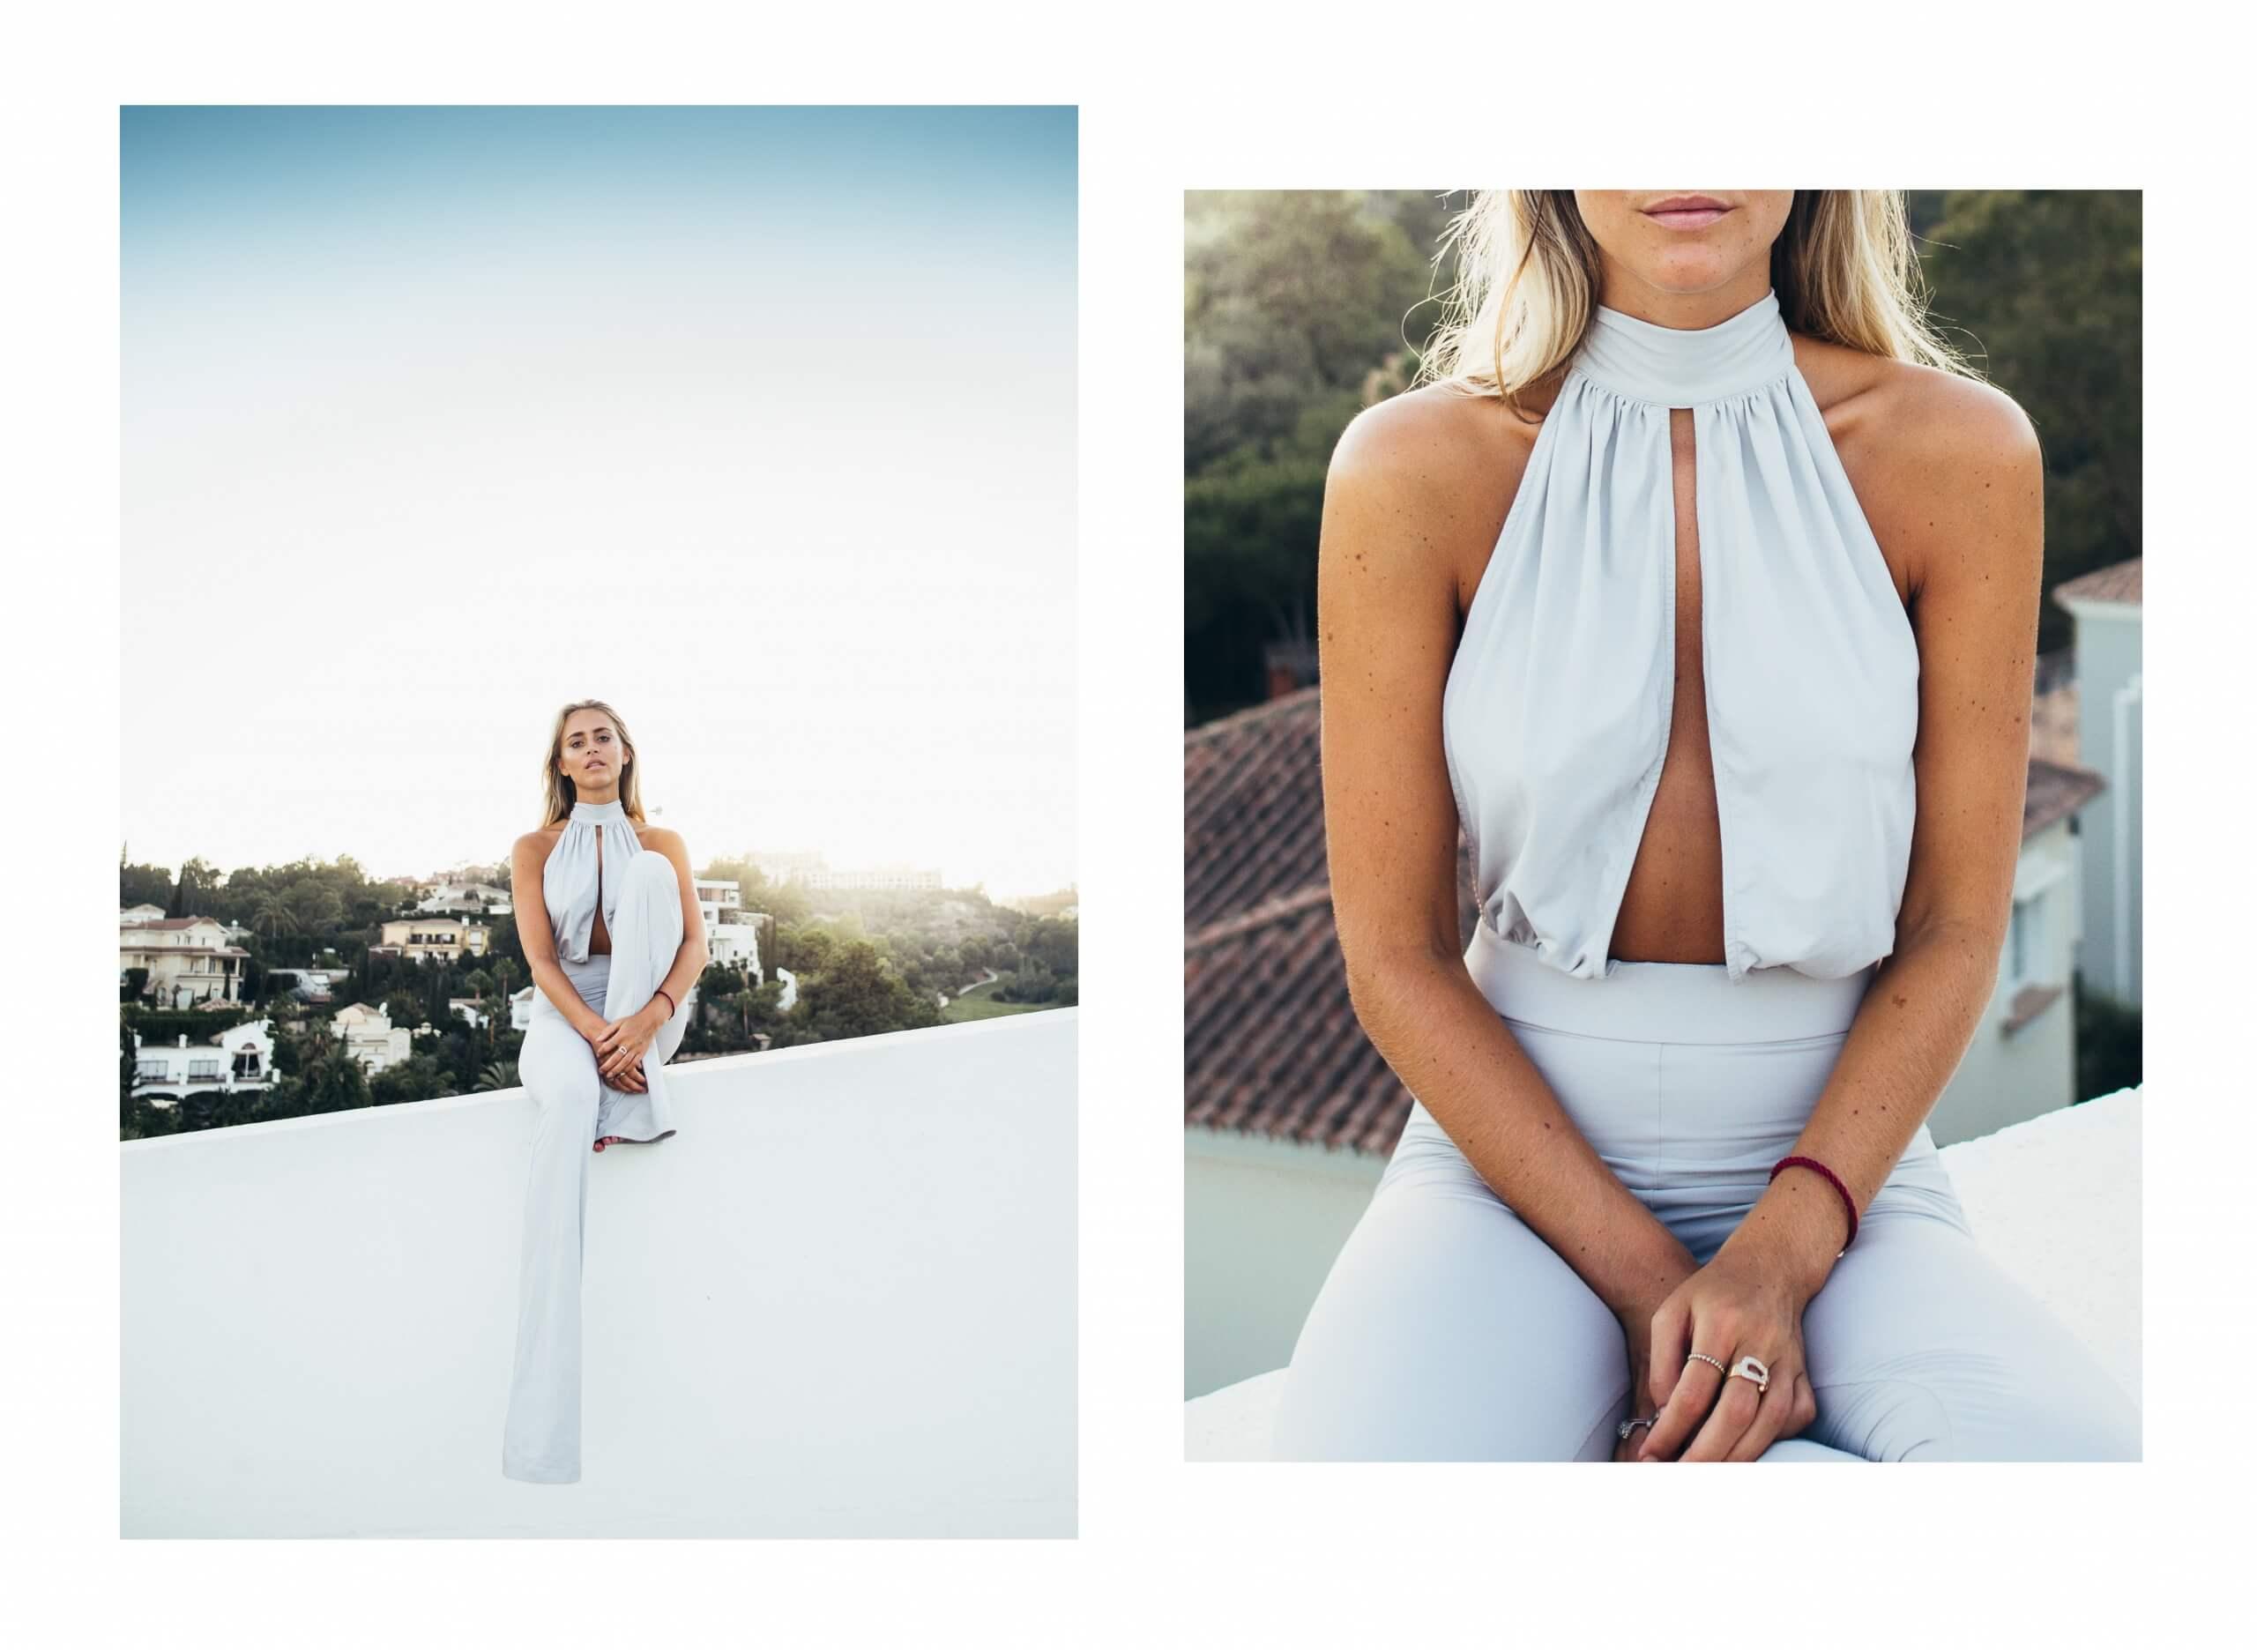 janni-deler-the-perfect-jumpsuit-sandra-haugeL1001394 copy